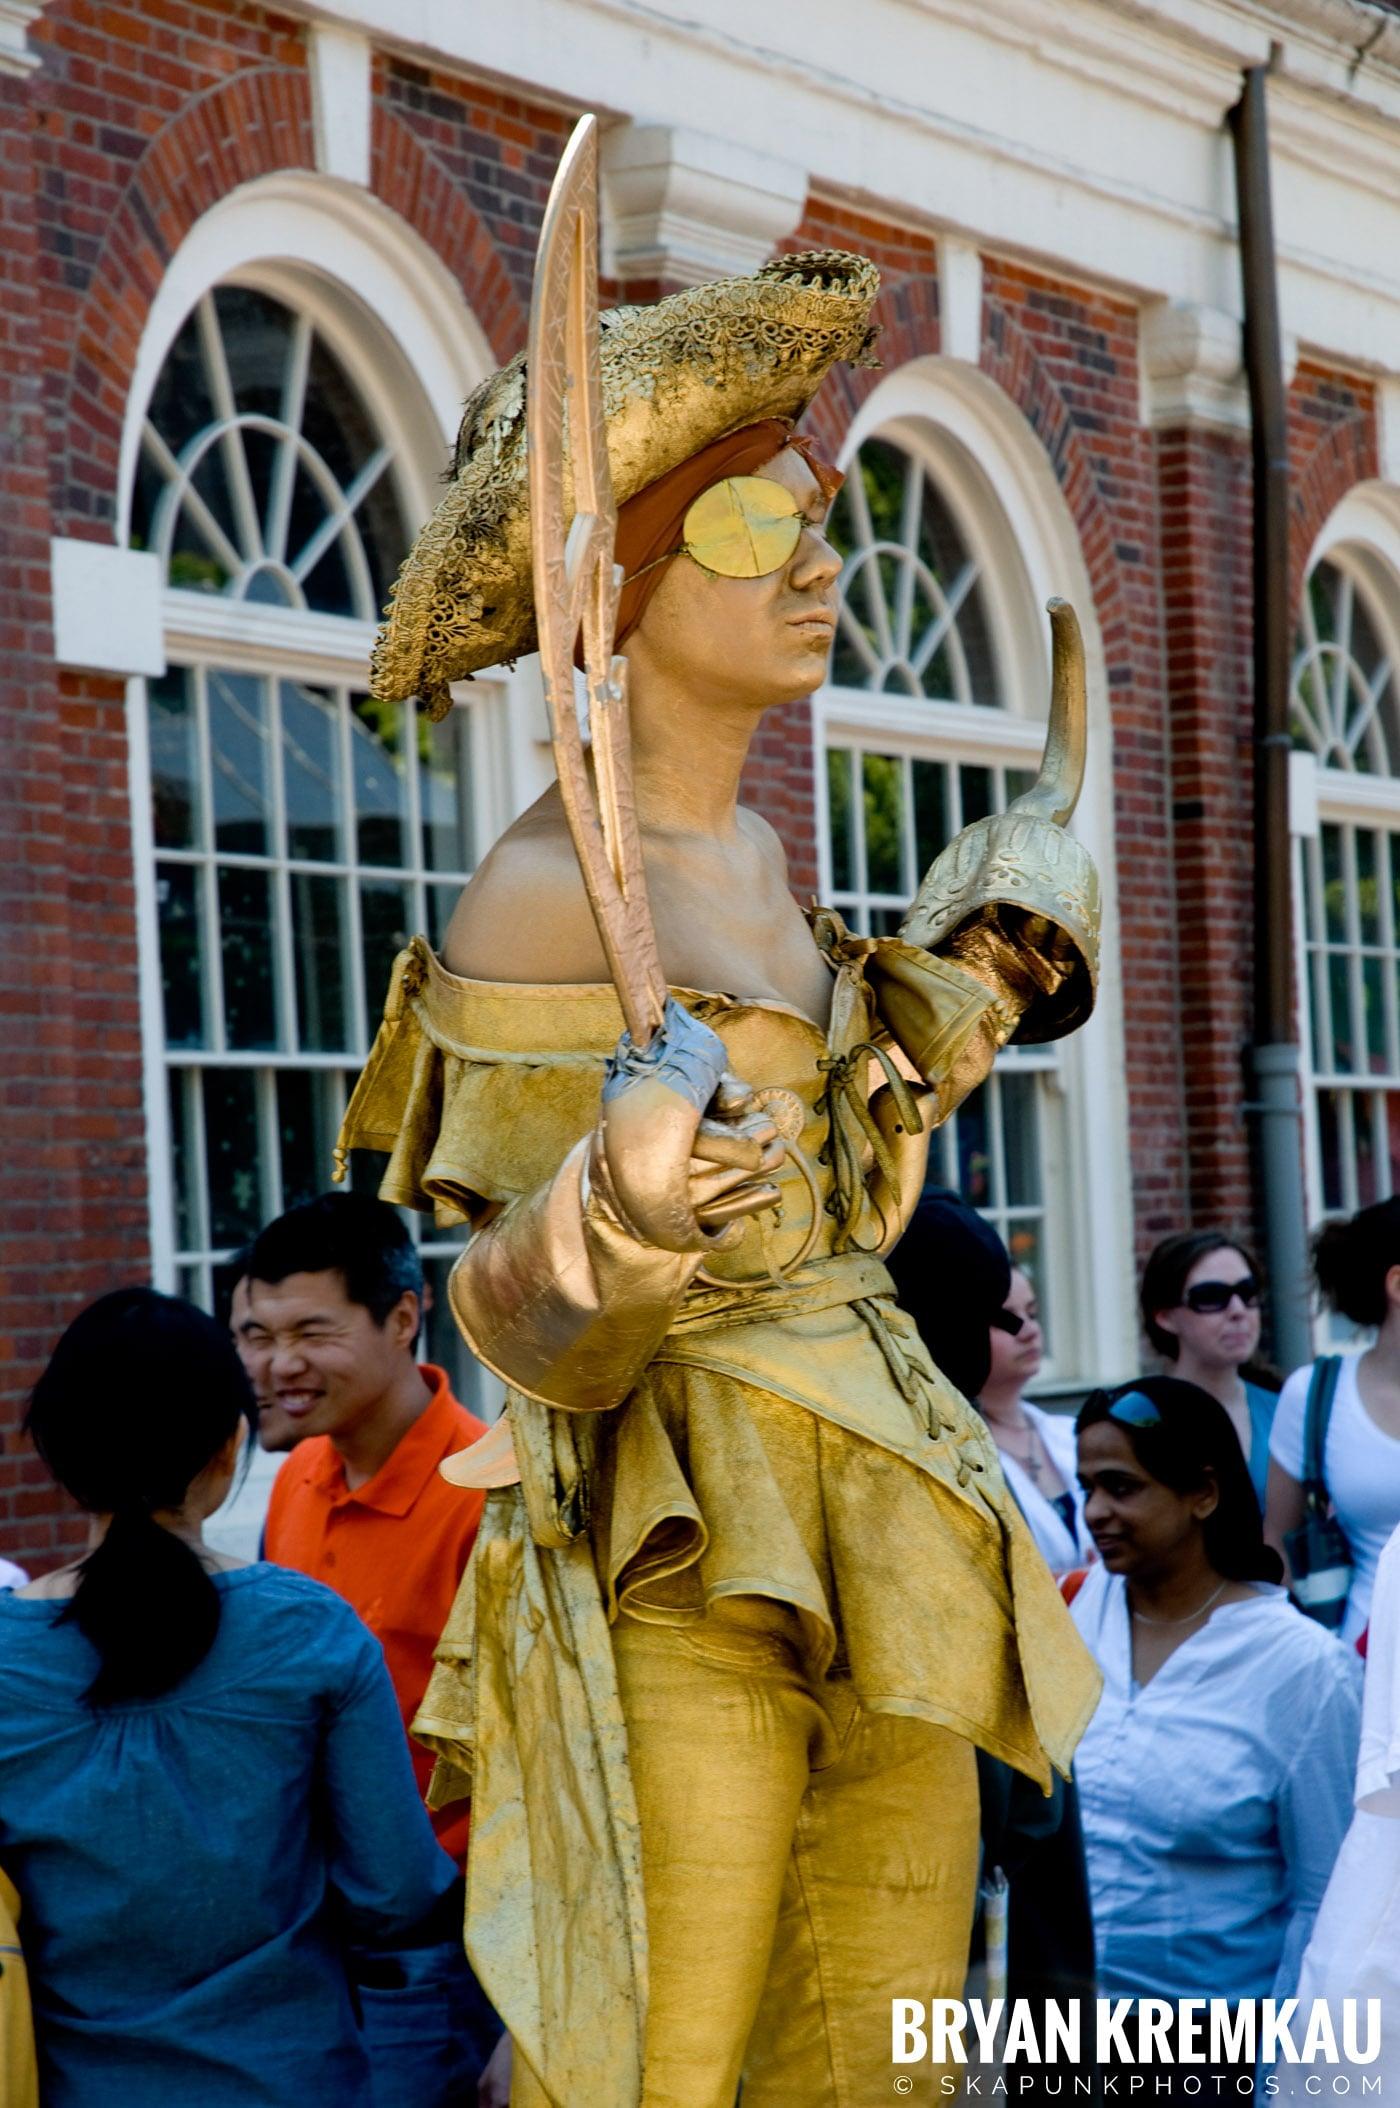 Memorial Day Weekend Trip to Boston - 5.25.08 (5)